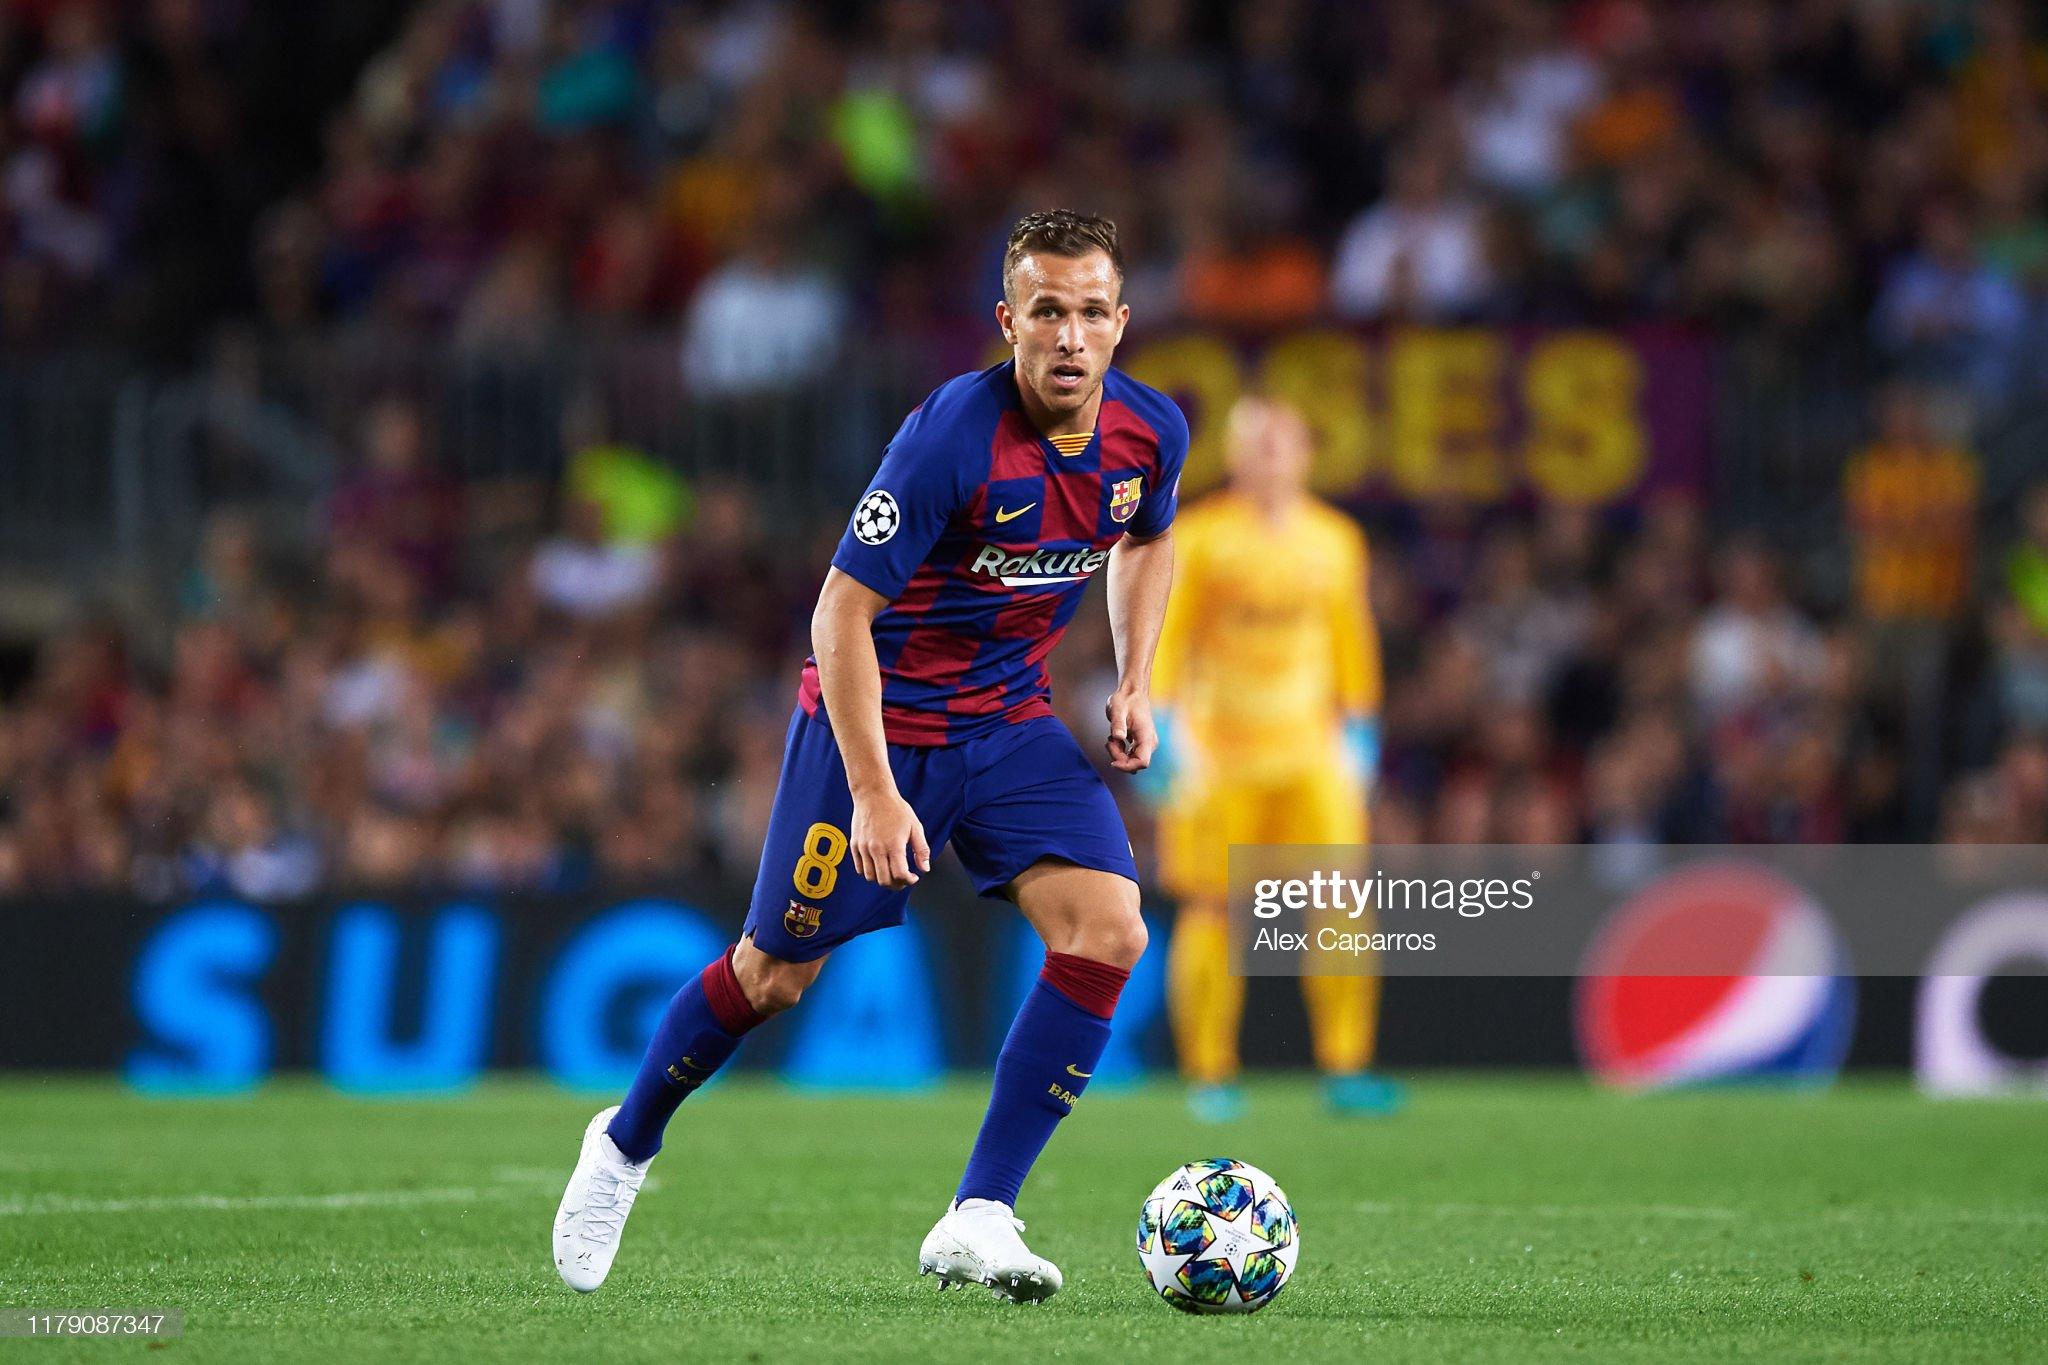 صور مباراة : برشلونة - إنتر 2-1 ( 02-10-2019 )  Arthur-melo-of-fc-barcelona-conducts-the-ball-during-the-uefa-league-picture-id1179087347?s=2048x2048